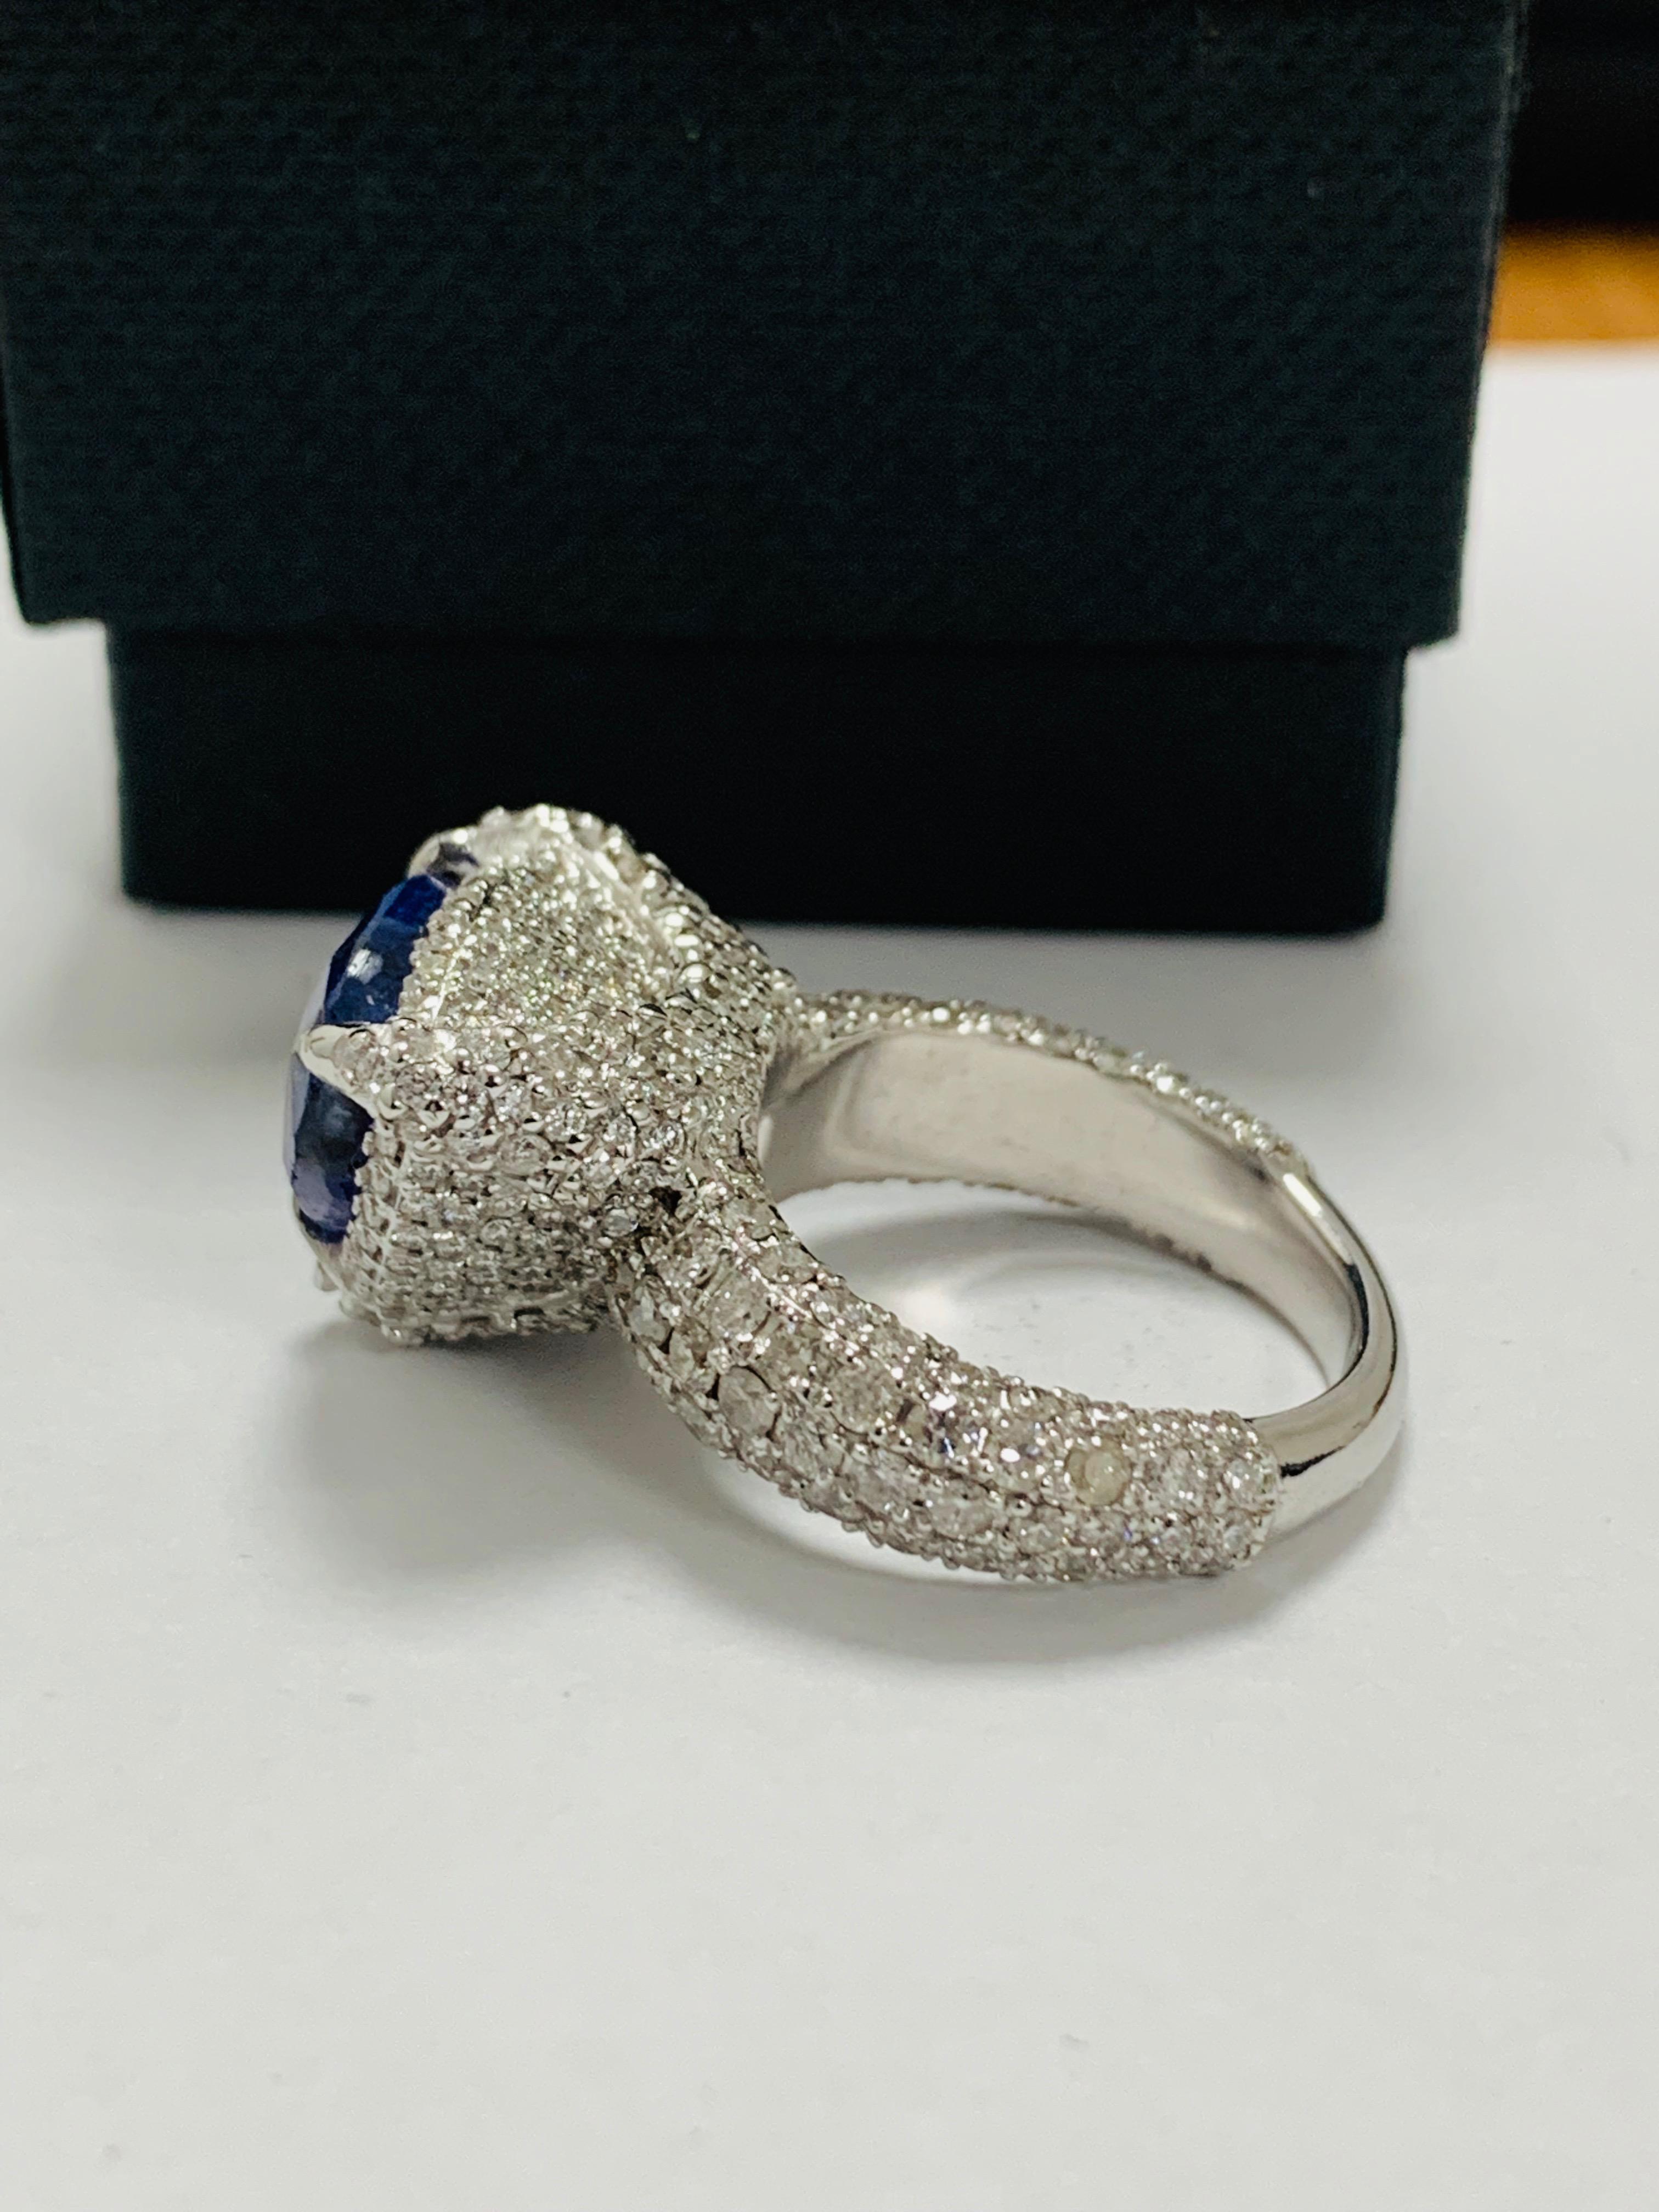 platinum tanzanite ring - Image 5 of 13